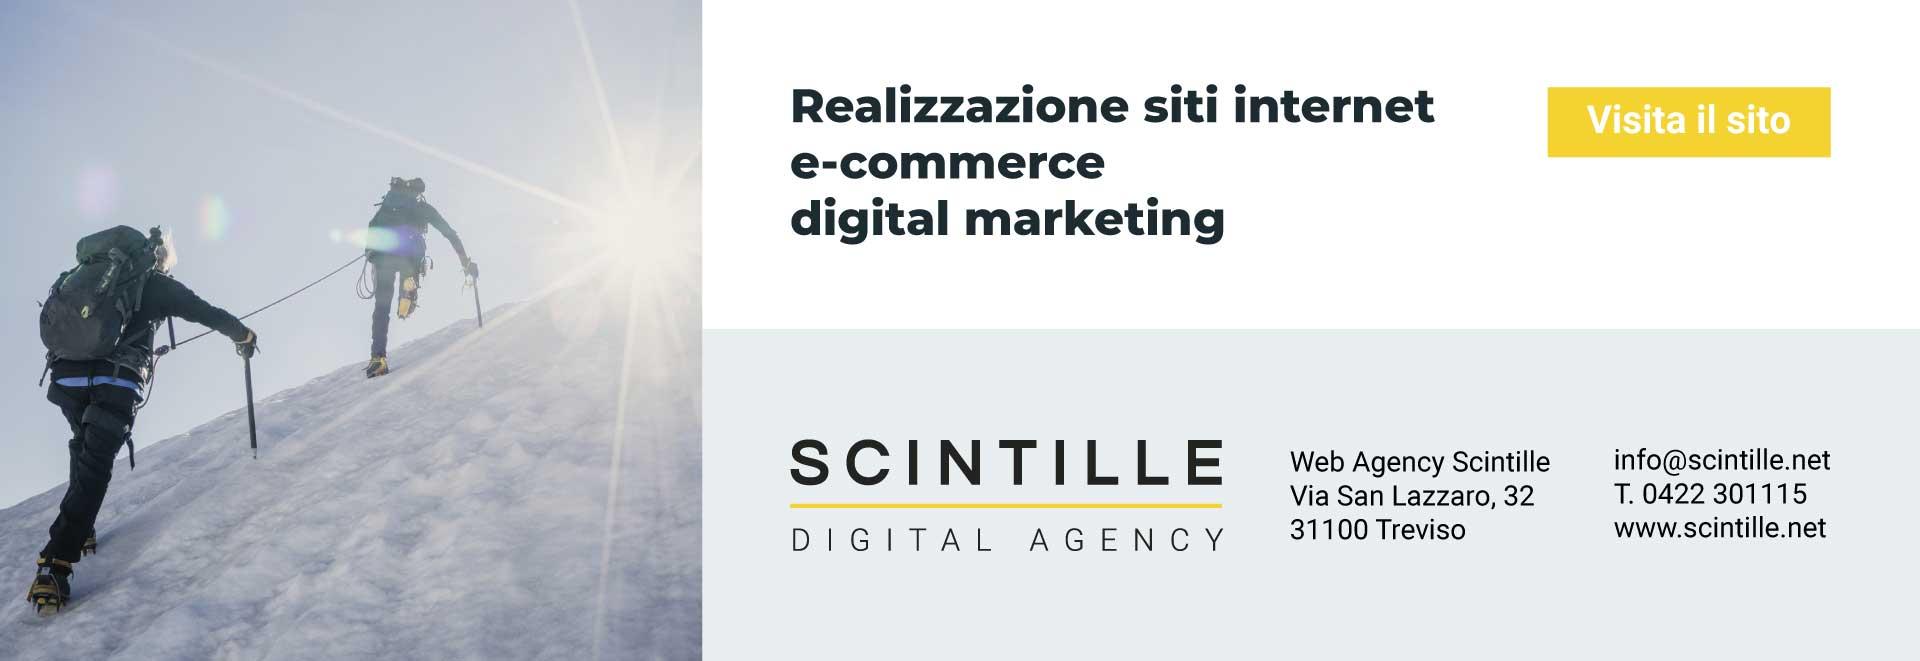 scintille-digital-agency-Banner